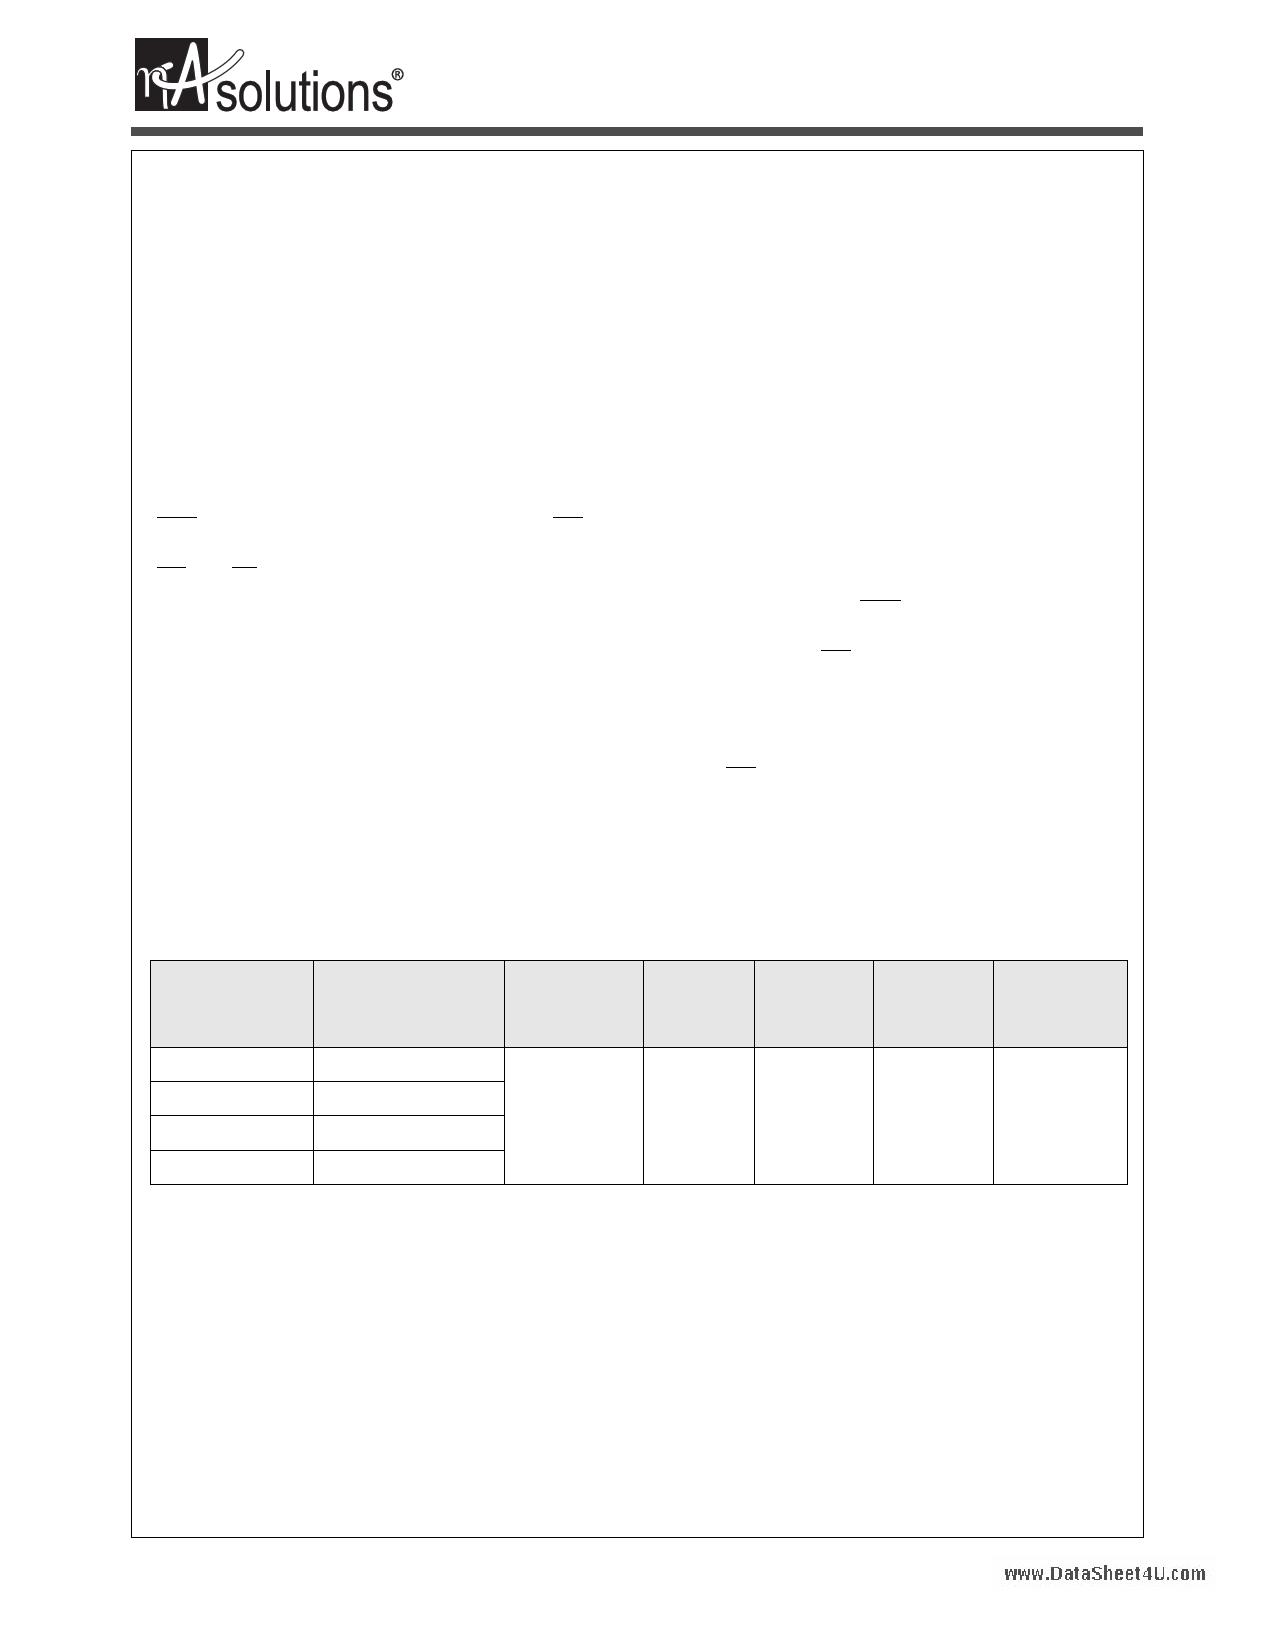 N01L163WC2A datasheet